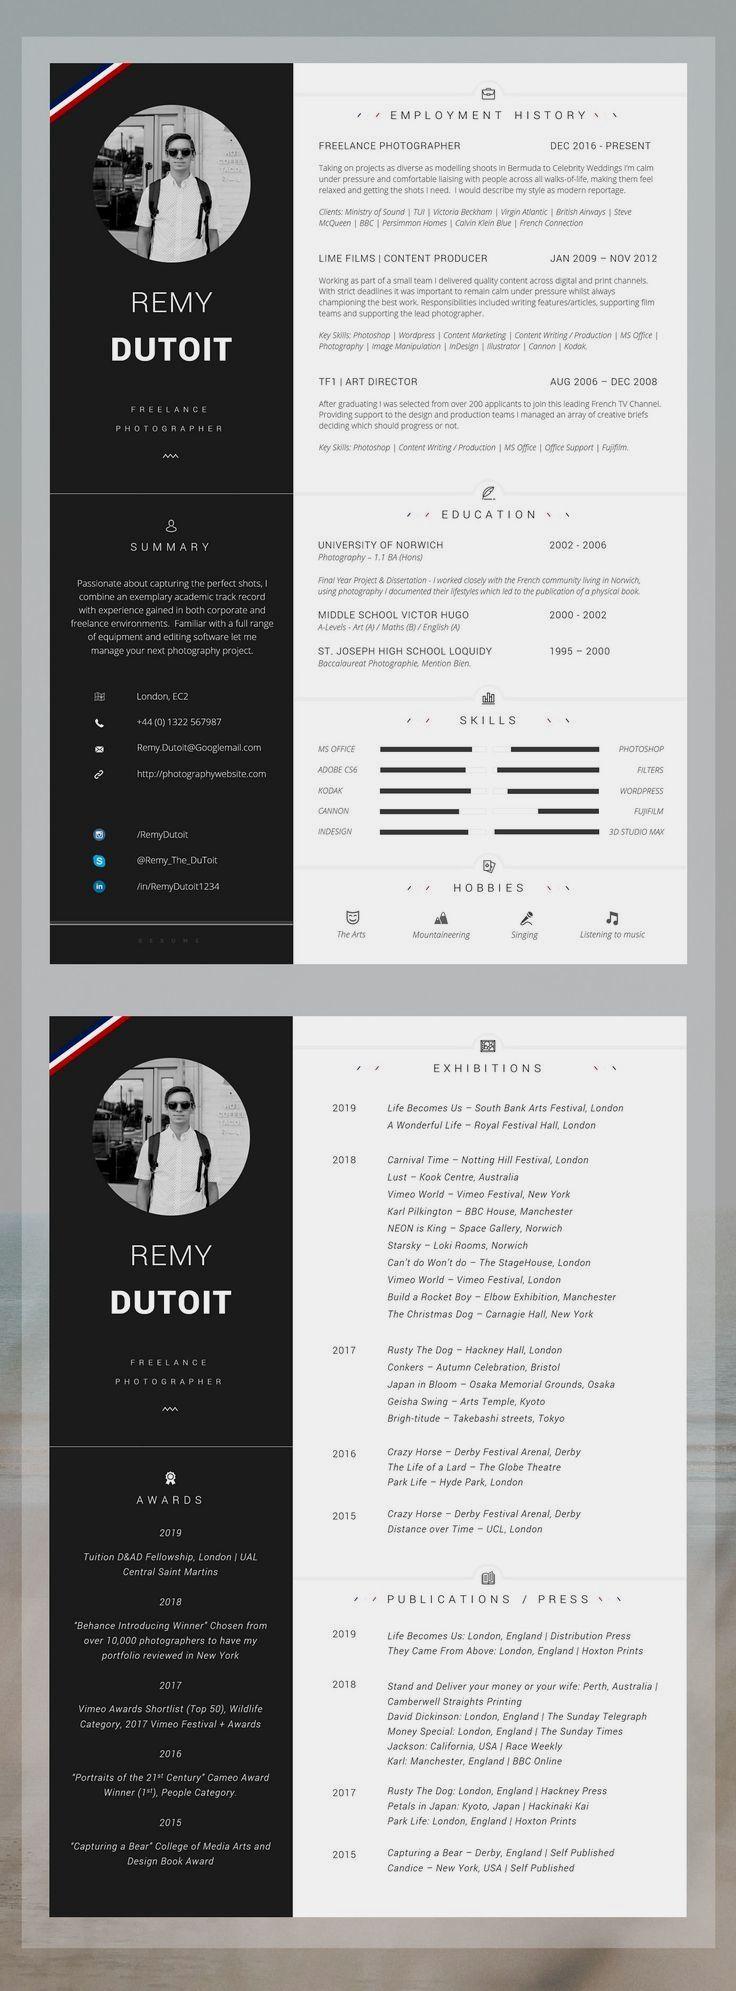 Basic Resume Templates Minimalist Resume Templates Photographer Resume Resume Design Template Creative Resume Templates